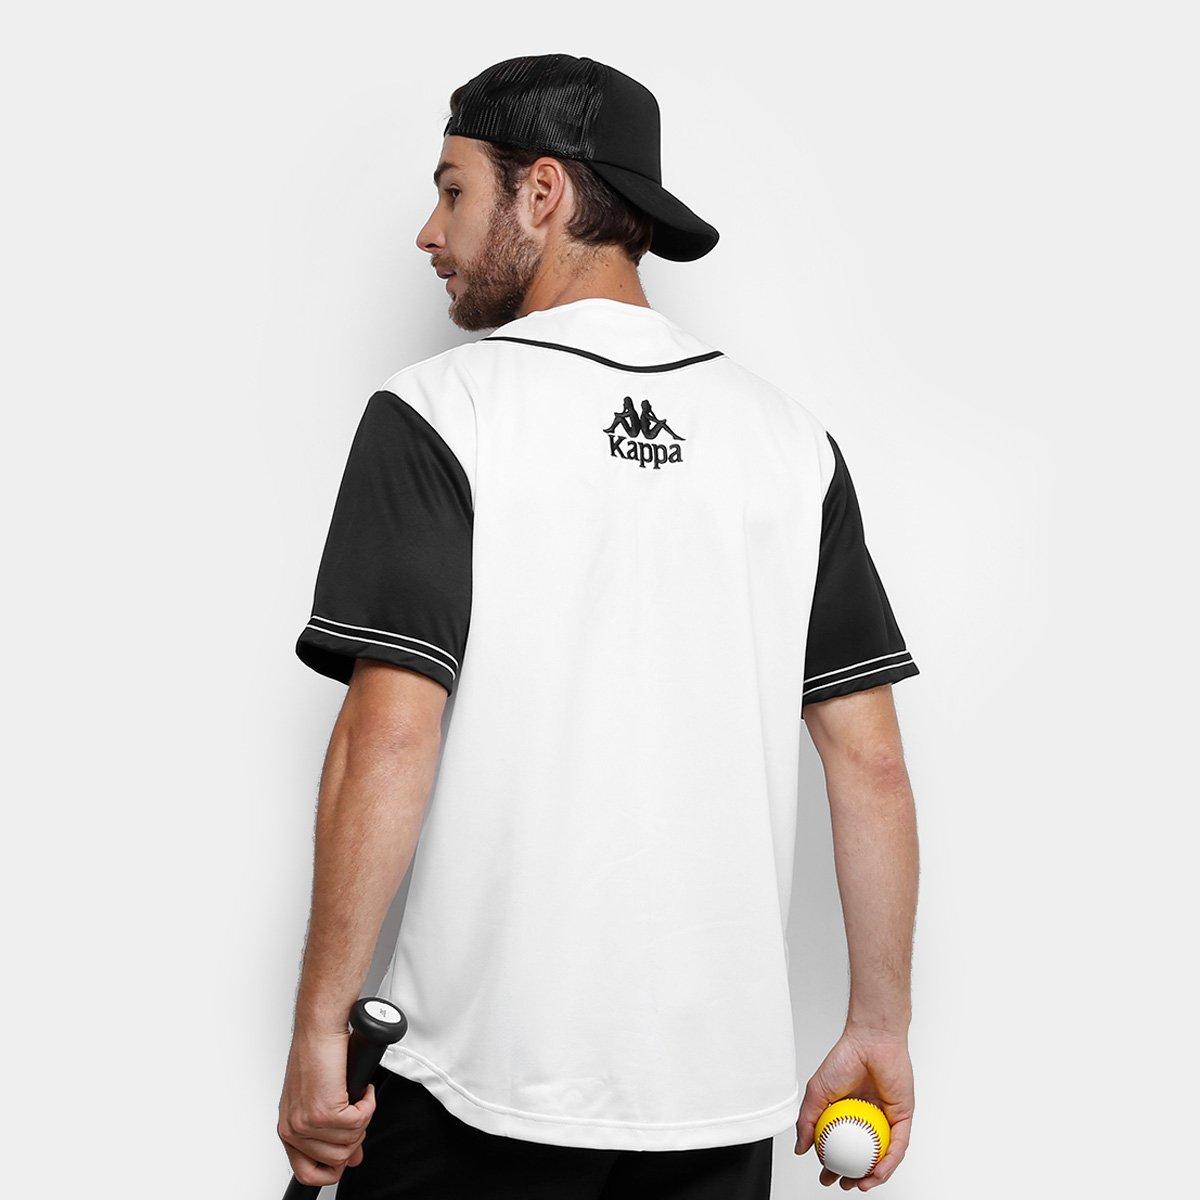 a0fcb3b55 Camisa Baseball Kappa New York Raglan 17 Masculina - Compre Agora ...